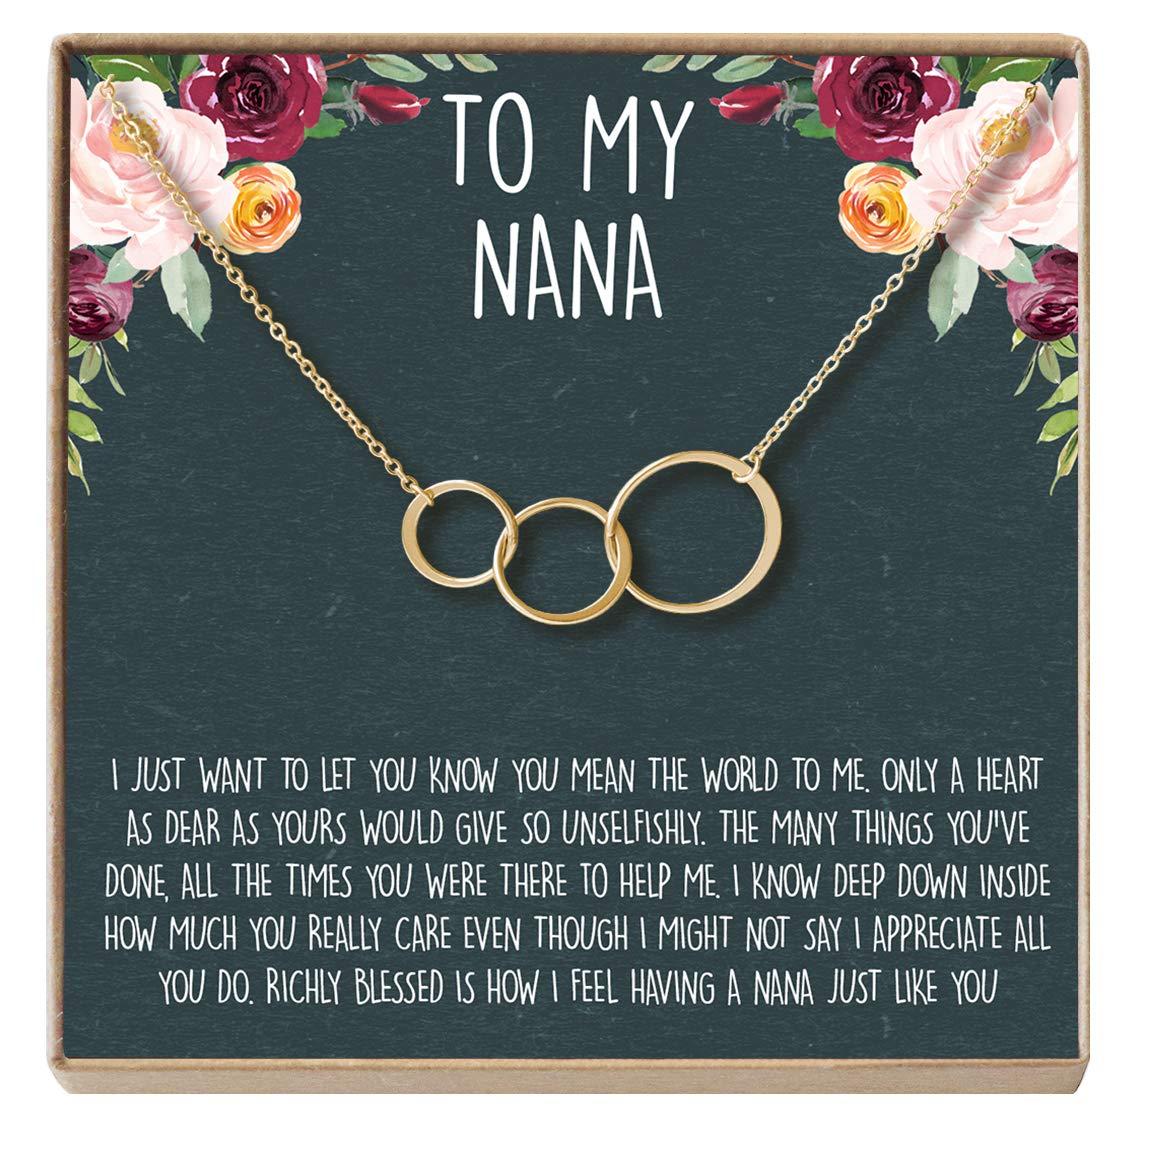 3 Asymmetrical Circles 3 Asymmetrical Circles Gold-Plated-Brass NA for Grandma Dear Ava Nana Gift Necklace: Nana Jewelry Grandmother